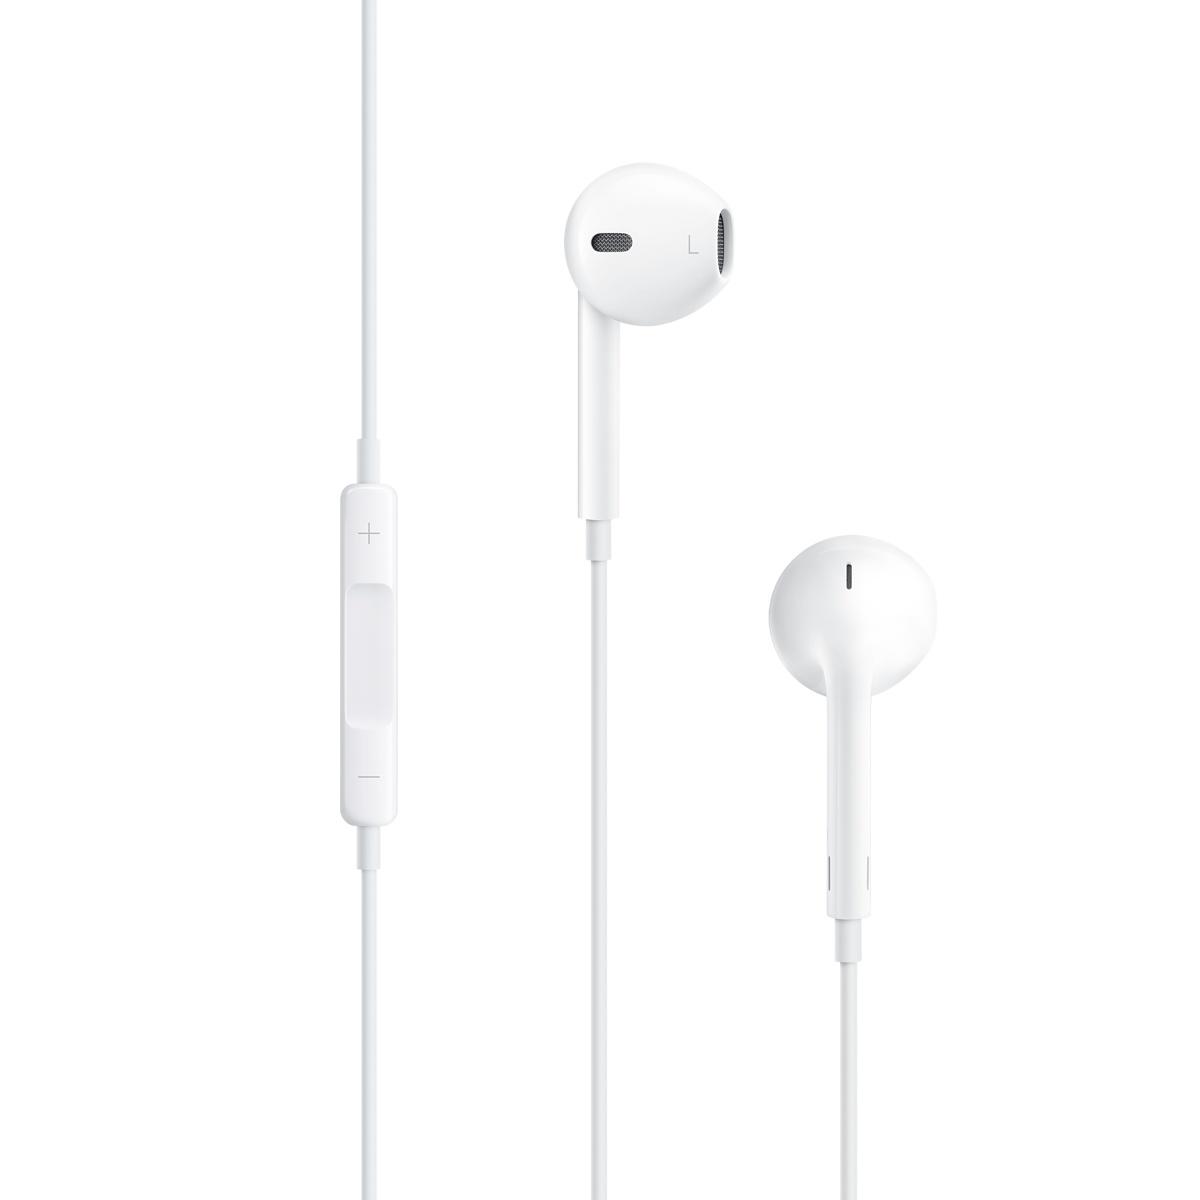 Наушники Apple EarPods для iPhone/iPod/iPad (MD827Z/MA - MNHF2ZM/A)Внутриканальные наушники<br>Наушники Apple EarPods с разъёмом 3,5 мм<br><br>Цвет товара: Белый<br>Материал: Пластик, силикон